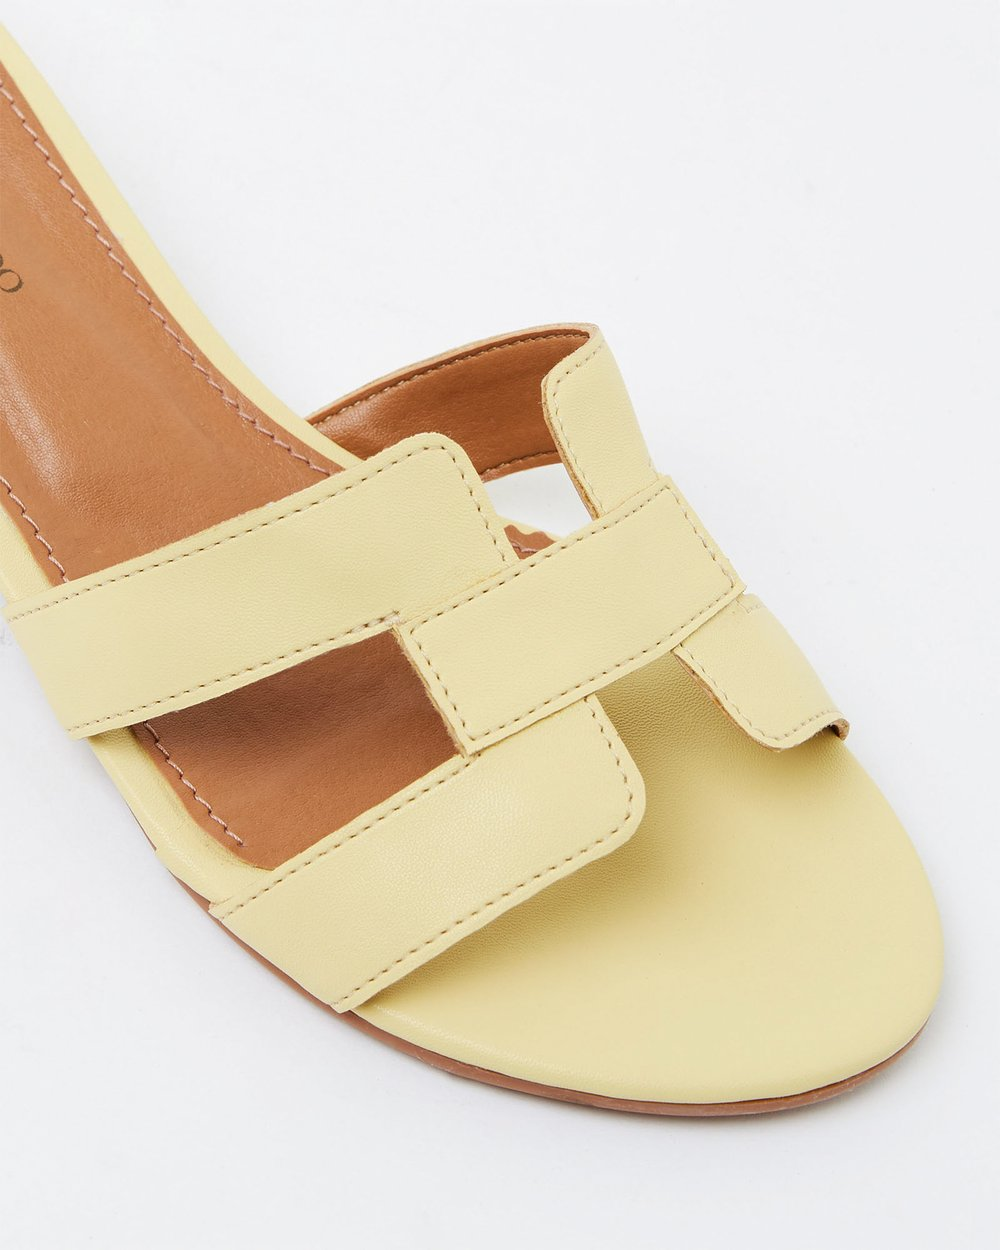 Debra - Yellow